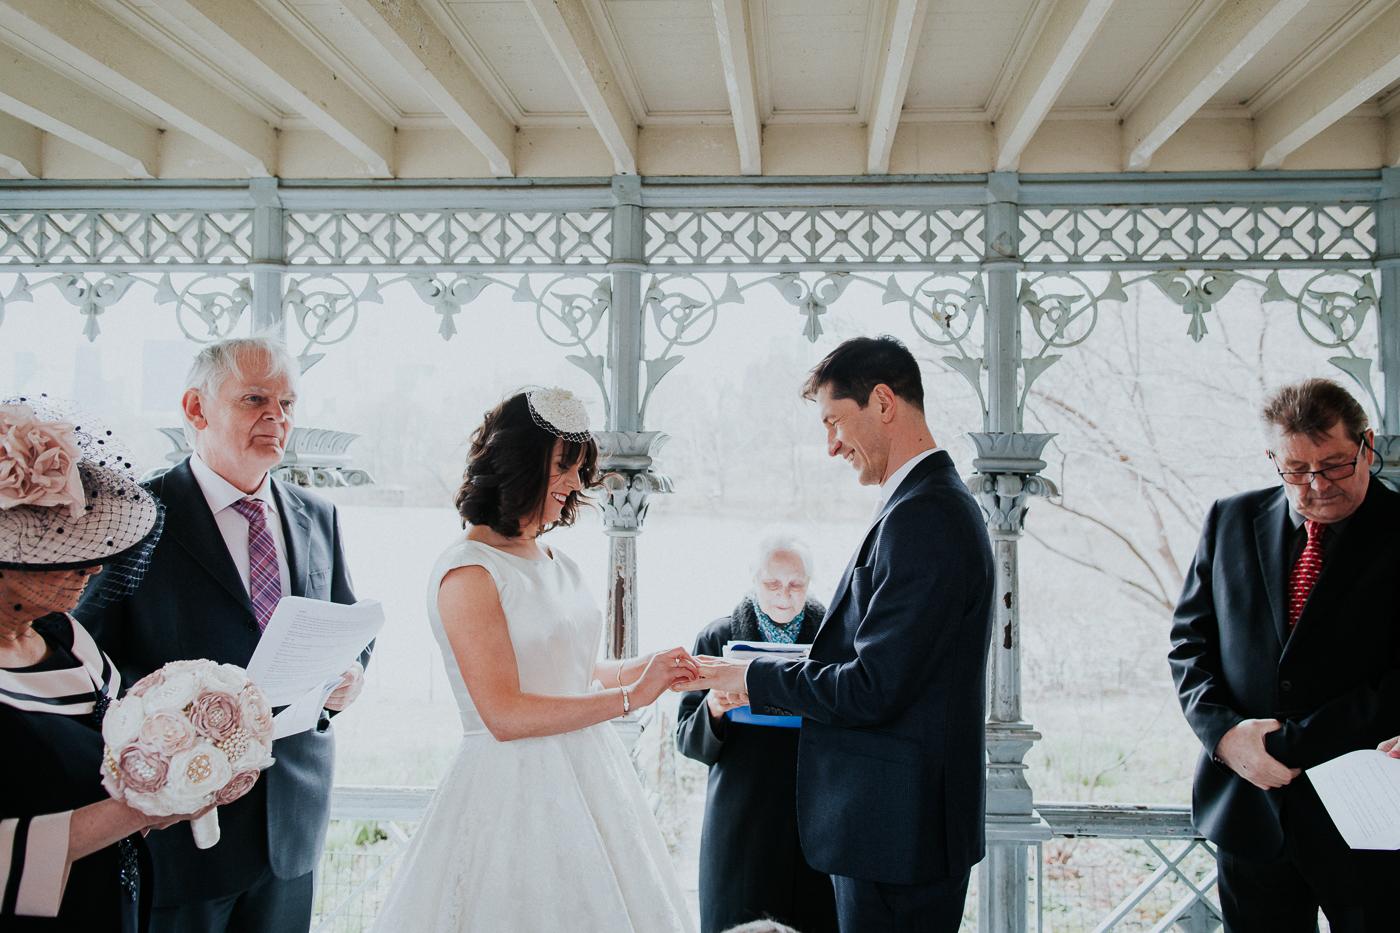 Ladies-Pavilion-Central-Park-NYC-Documentary-Elopement-Wedding-Photographer-31.jpg